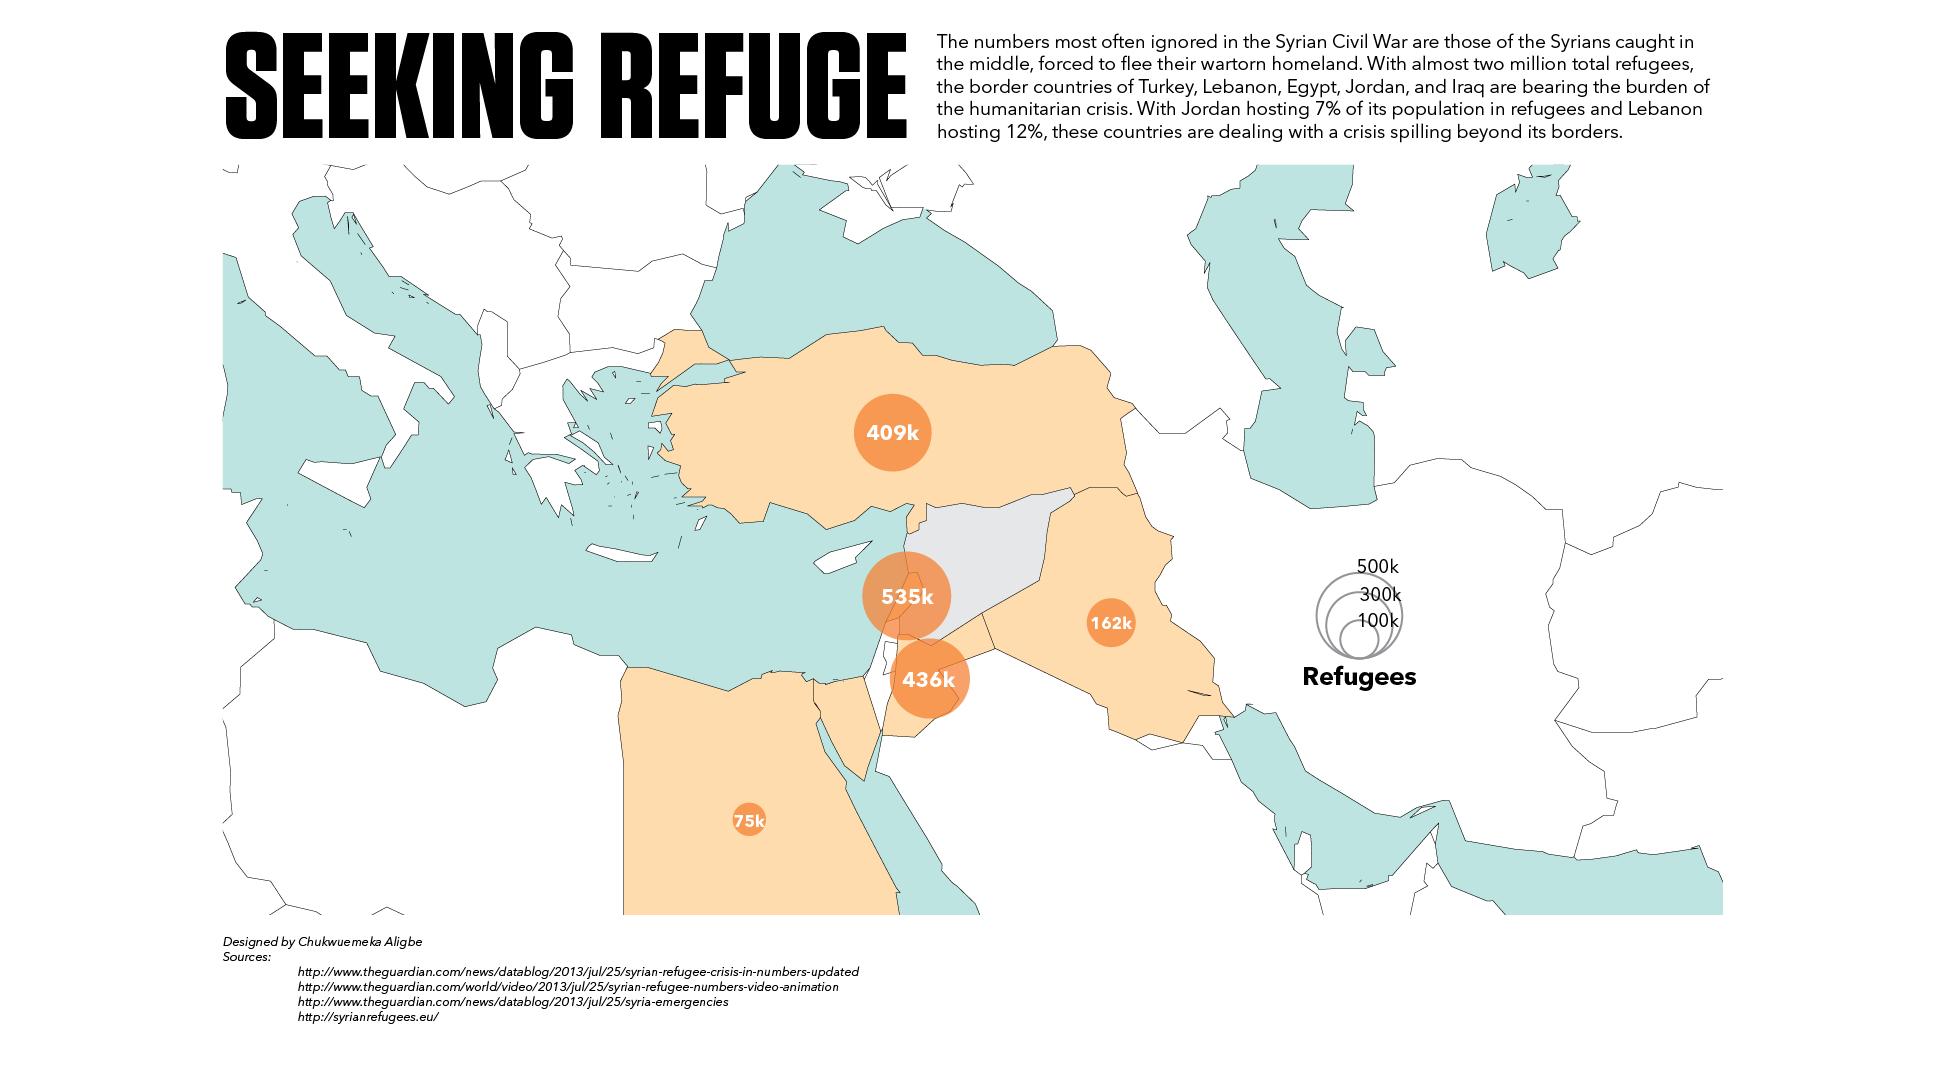 seeking refuge syrian refugee crisis